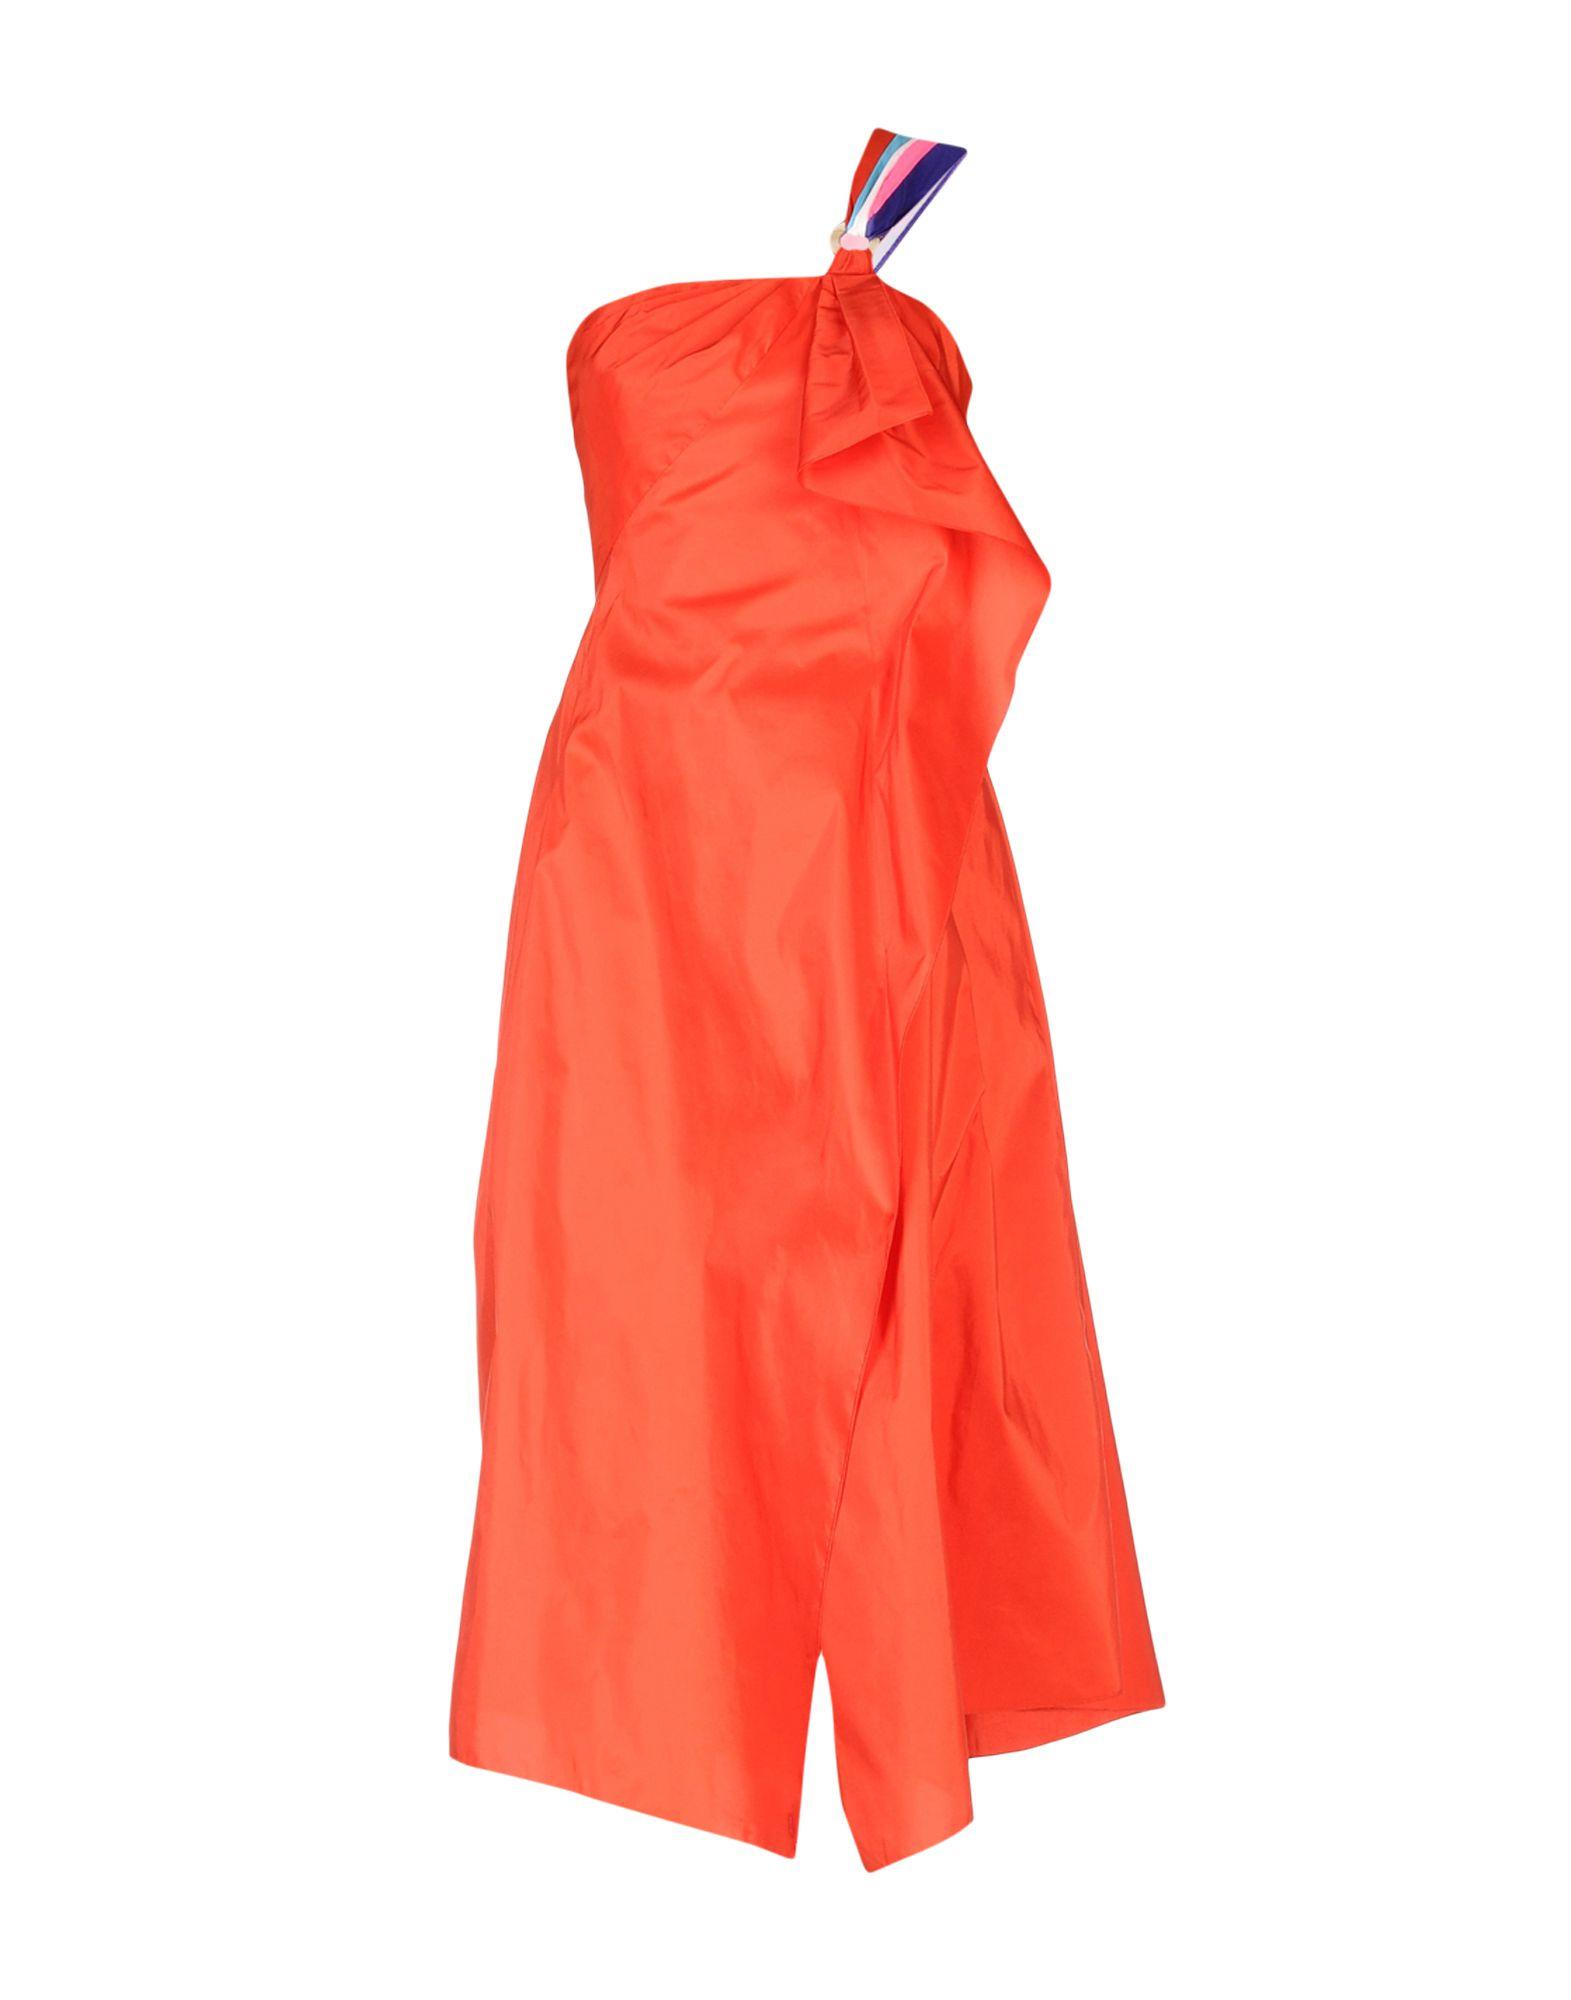 PETER PILOTTO Платье длиной 3/4 peter pilotto платье с вышивкой